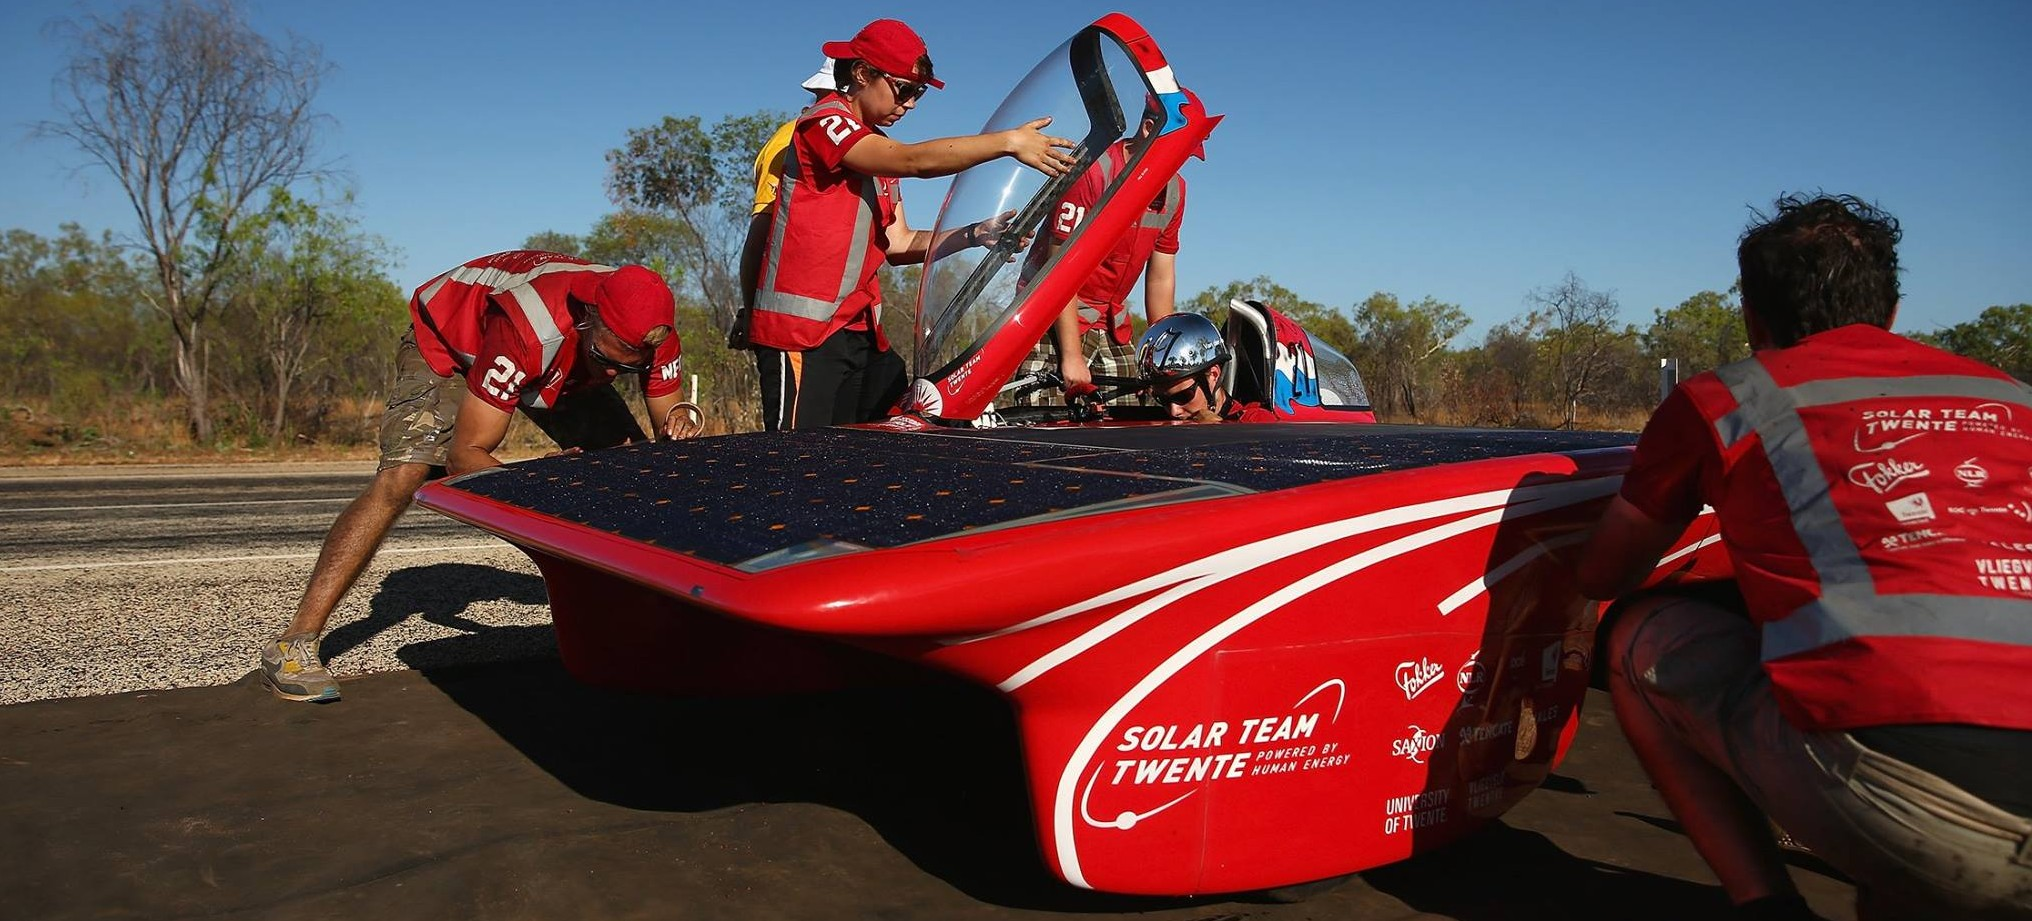 World Solar Challenge: Teams race 3,000 Km solar-powered cars